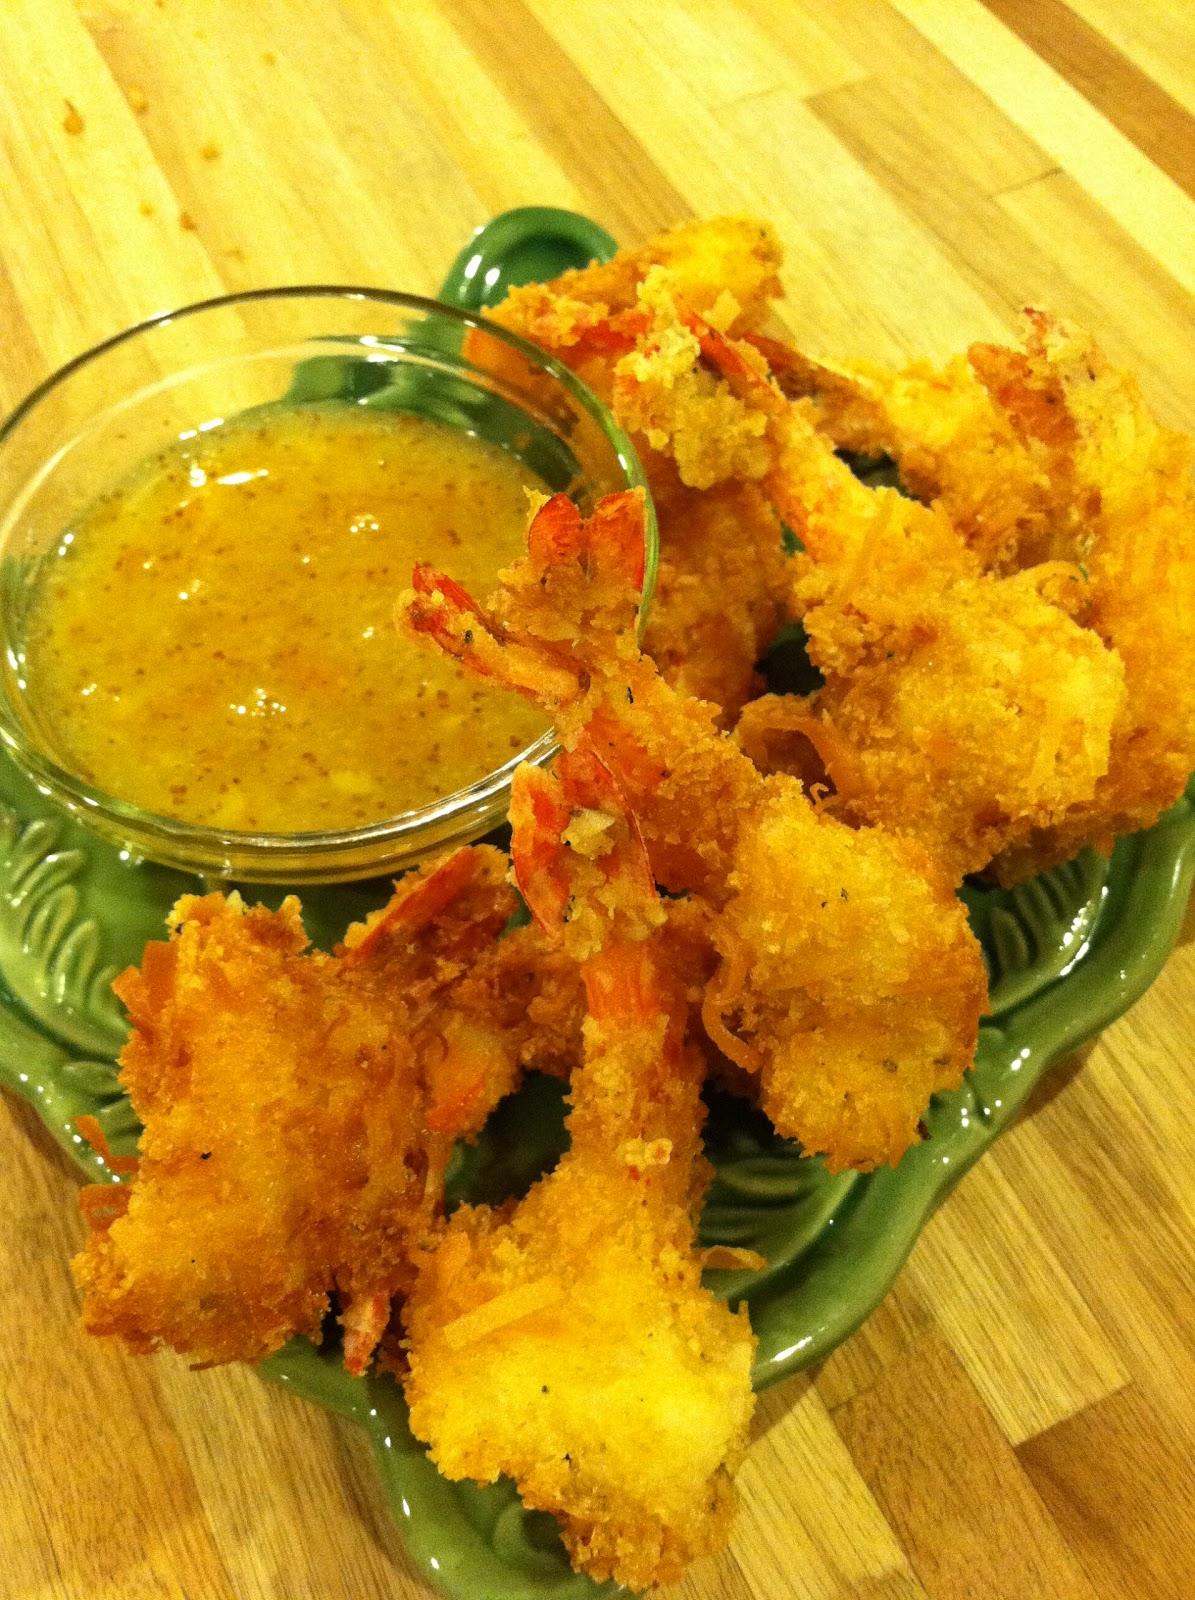 Melissa's Coconut Shrimp with Orange-Marmalade Sauce